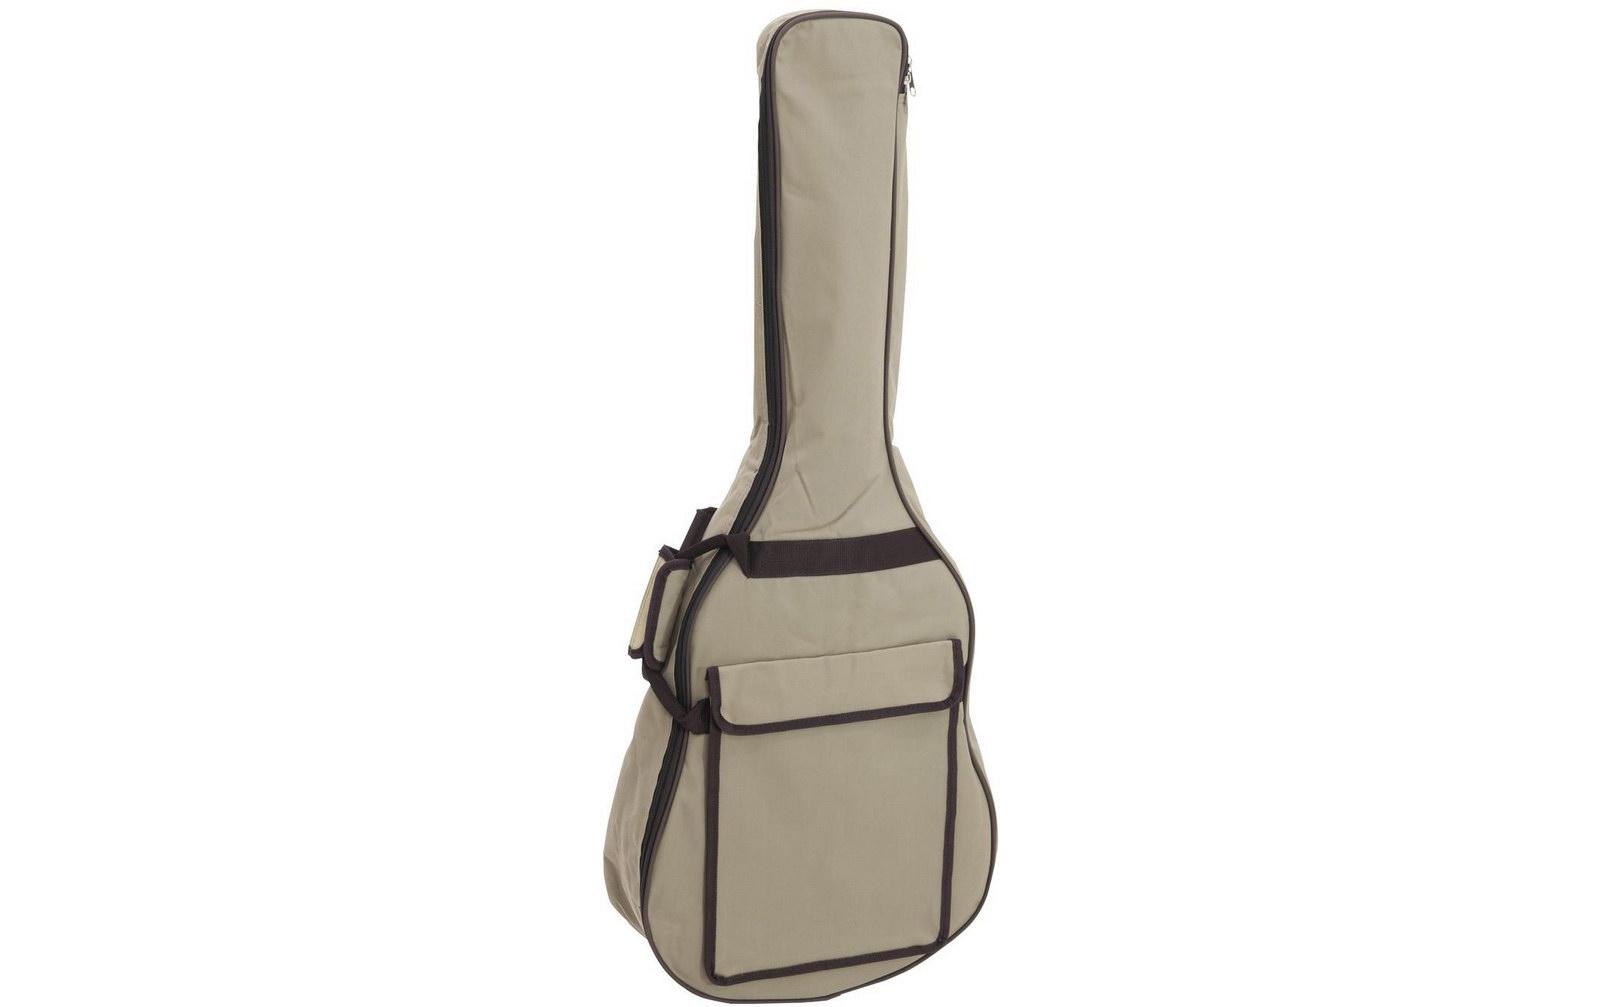 dimavery-csb-400-classic-guitar-bag-3-4